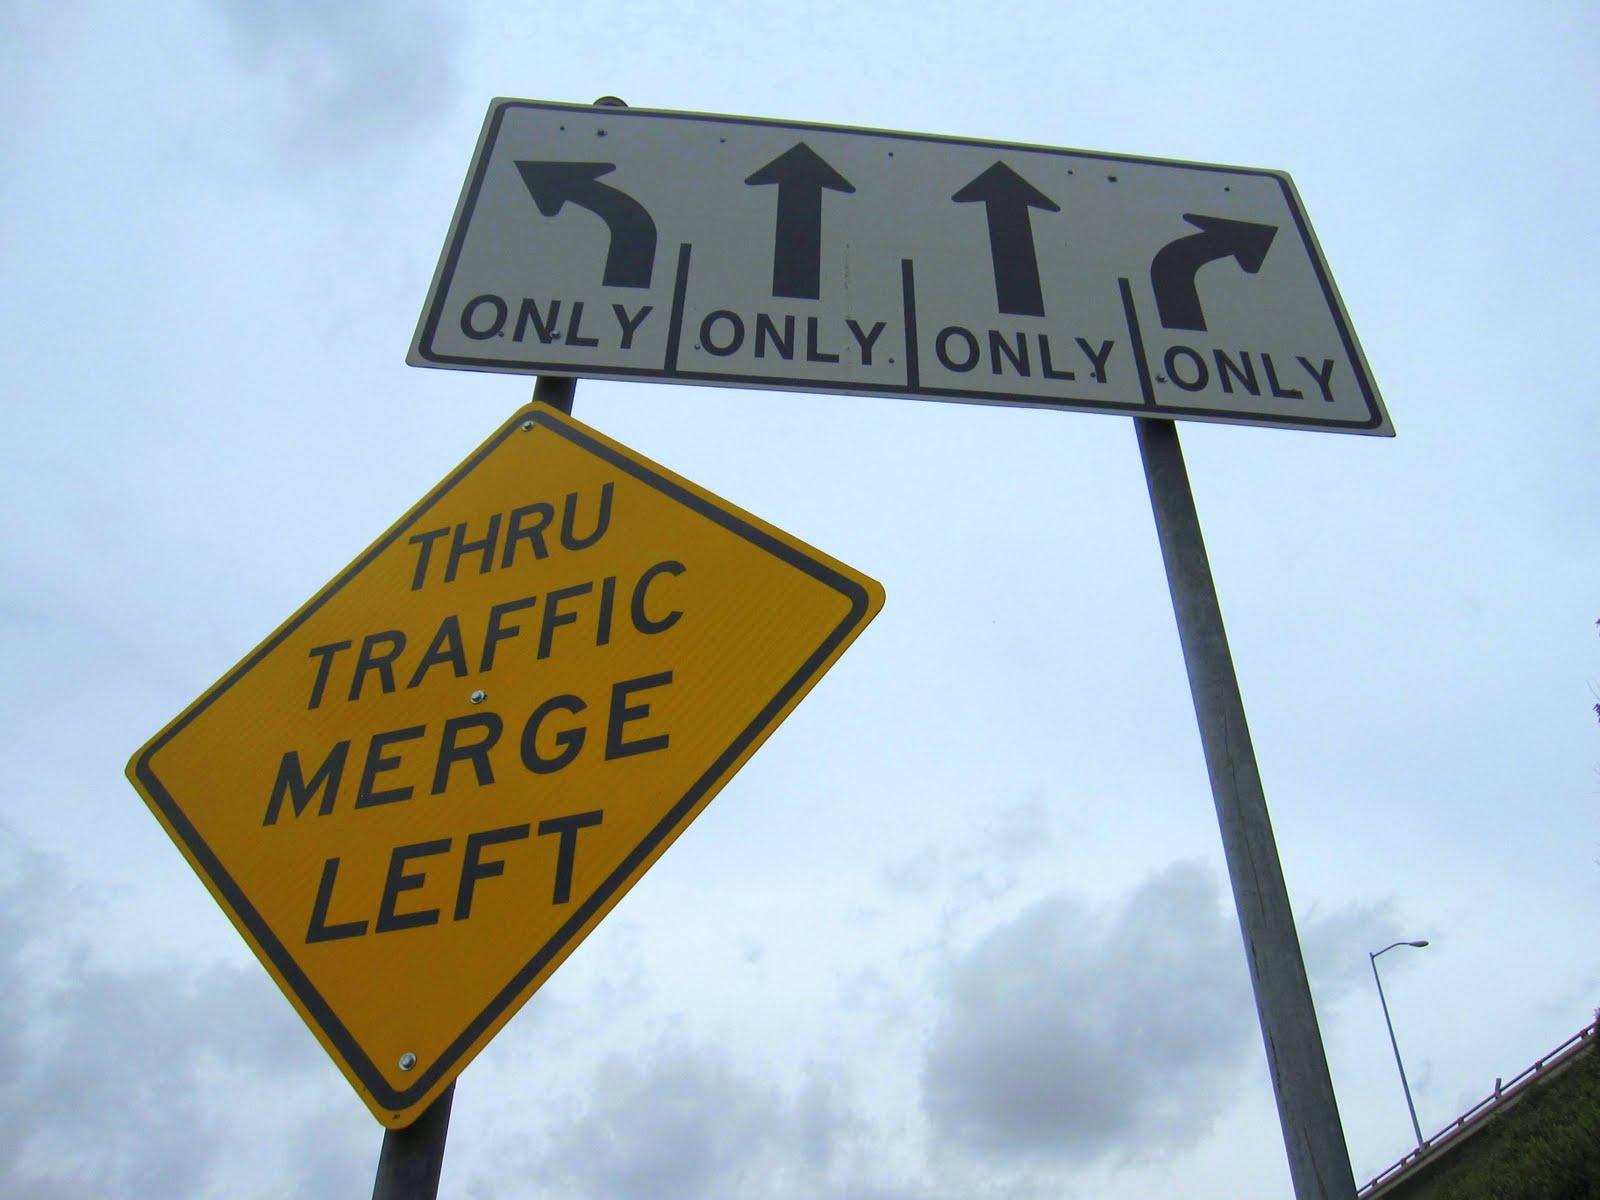 http://2.bp.blogspot.com/-JOTKjnAoTXo/TmPjZ4mnIEI/AAAAAAAAAkc/9VOVlWvS4_s/s1600/Confusing_street_signs.jpg